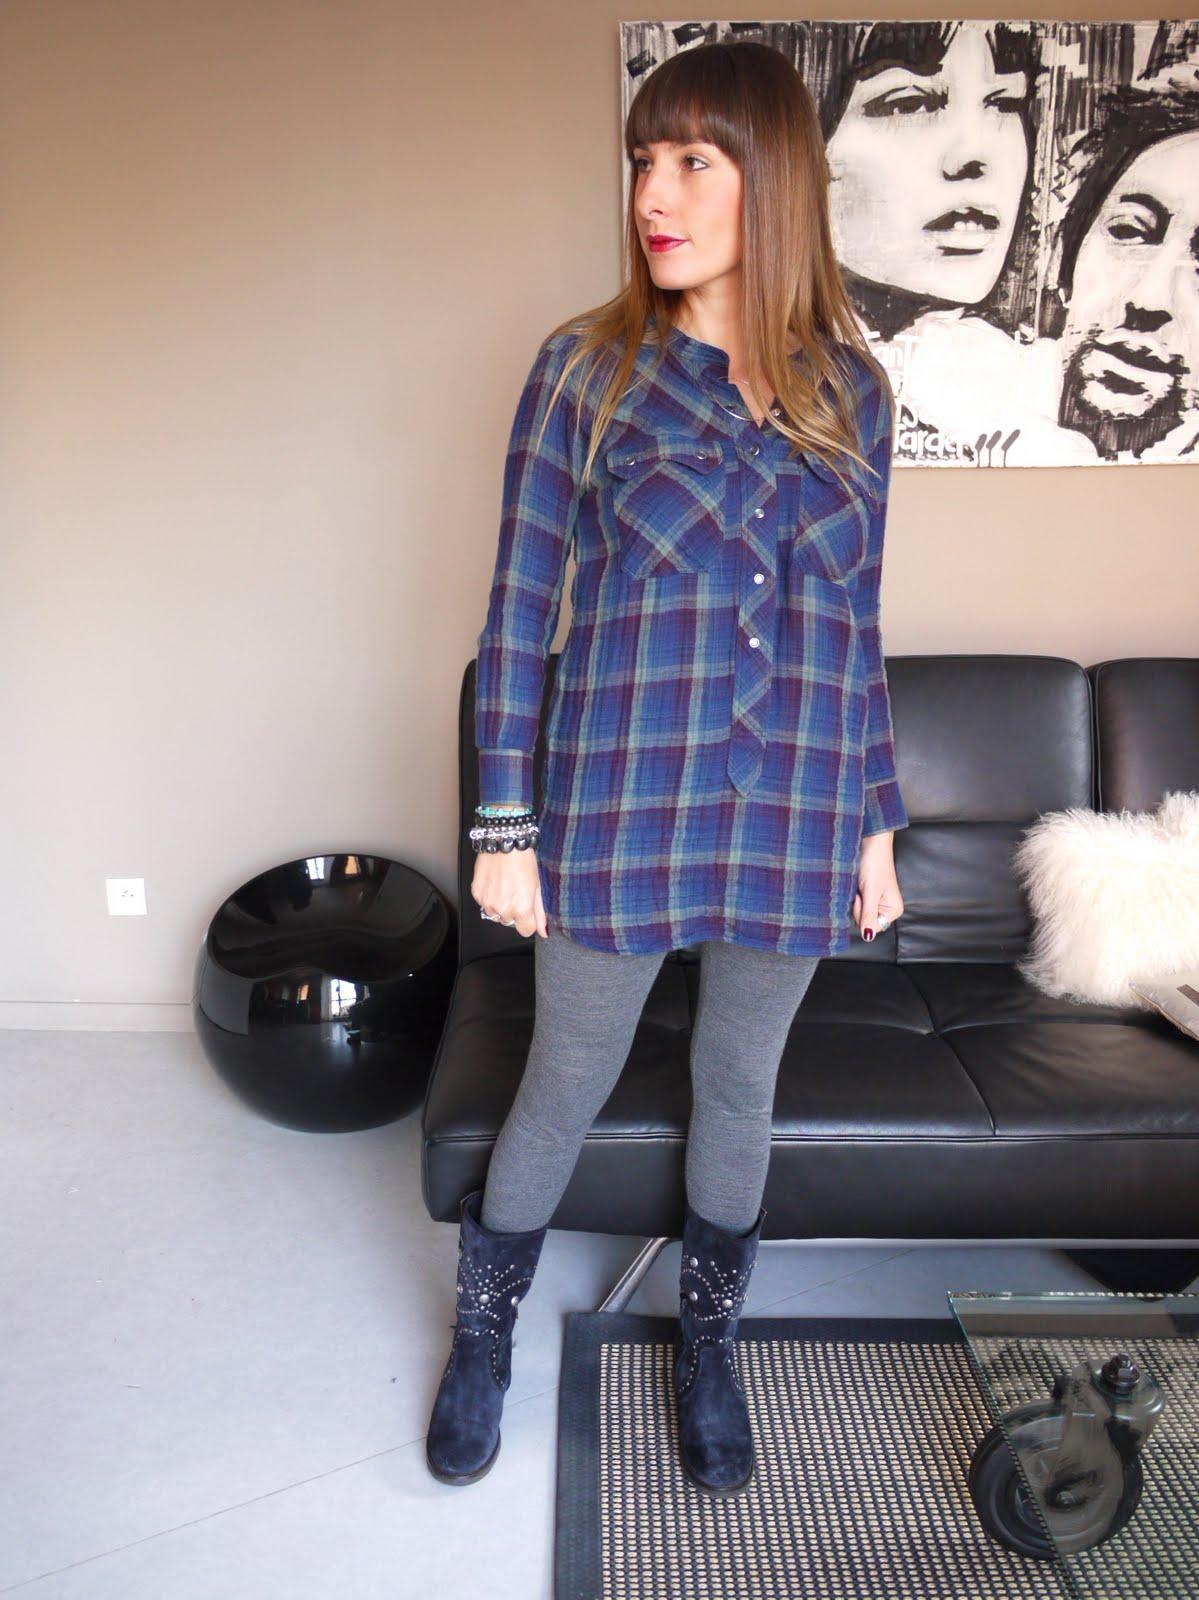 blog mode et beaut lille audressing my plaid. Black Bedroom Furniture Sets. Home Design Ideas